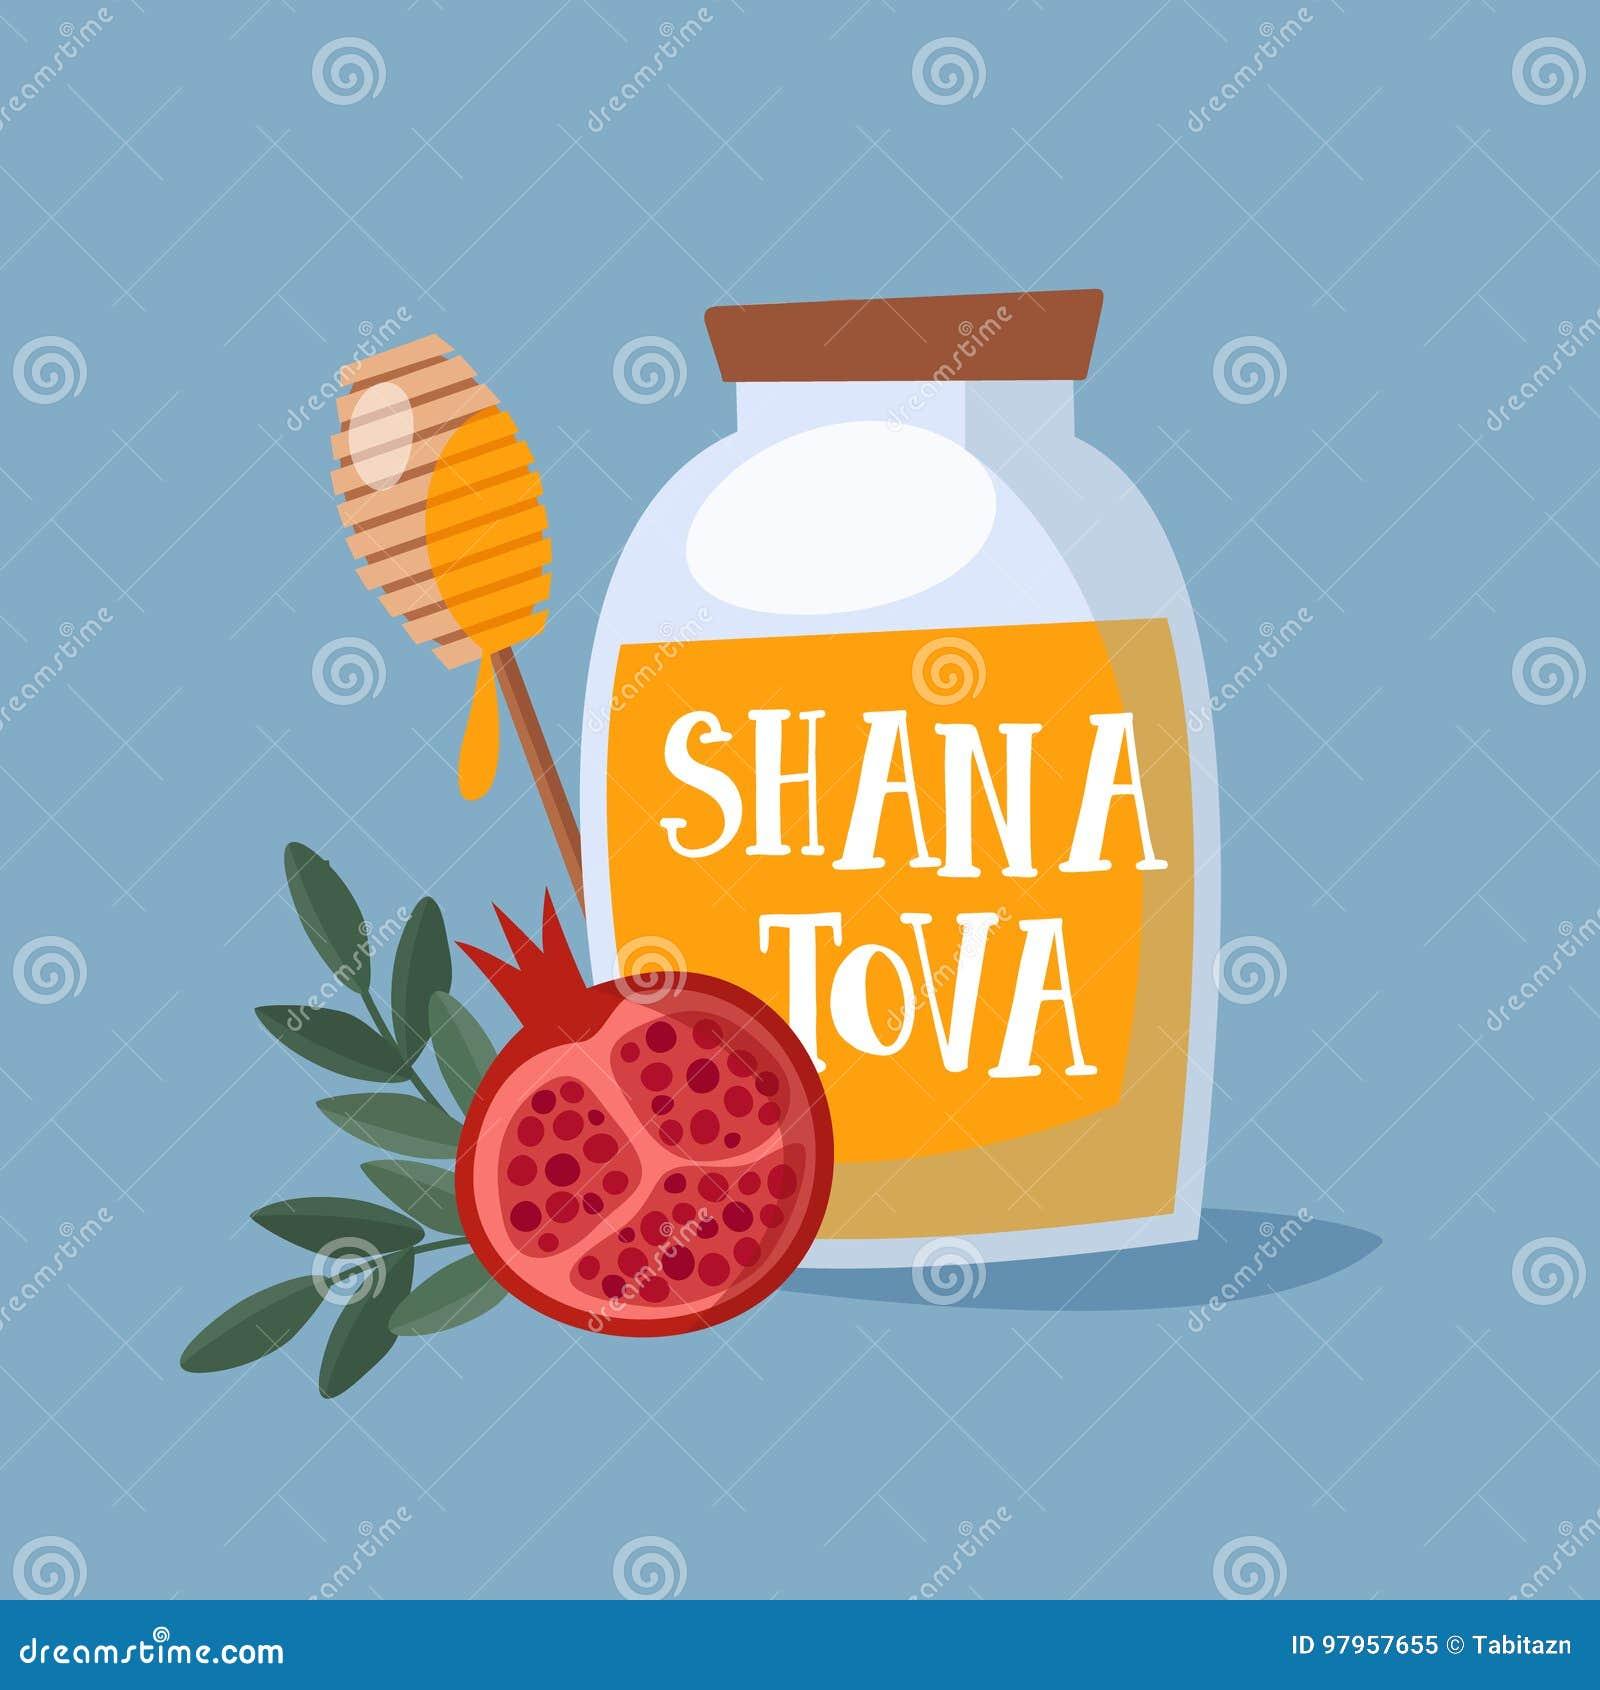 Shana Tova Greeting Card Invitation For Jewish New Year Rosh